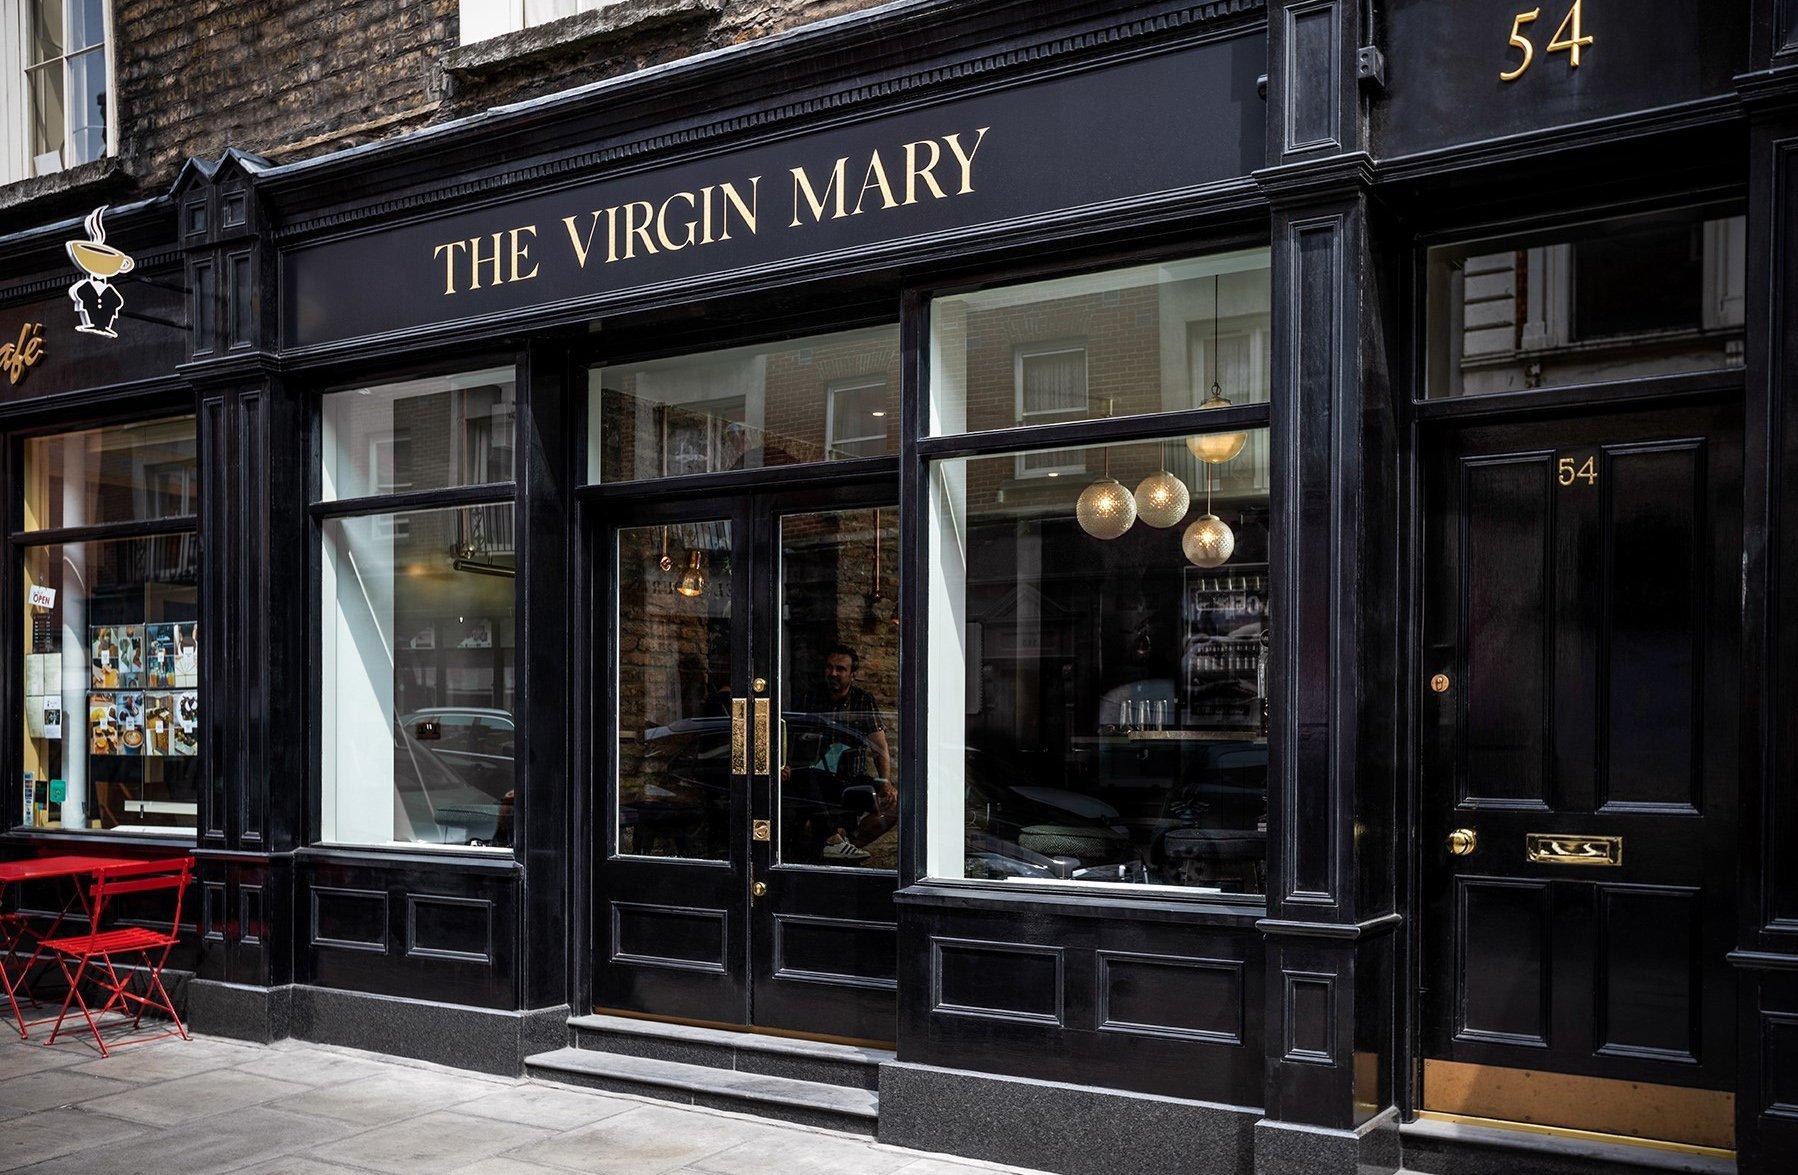 Virgin Mary Bar Outside